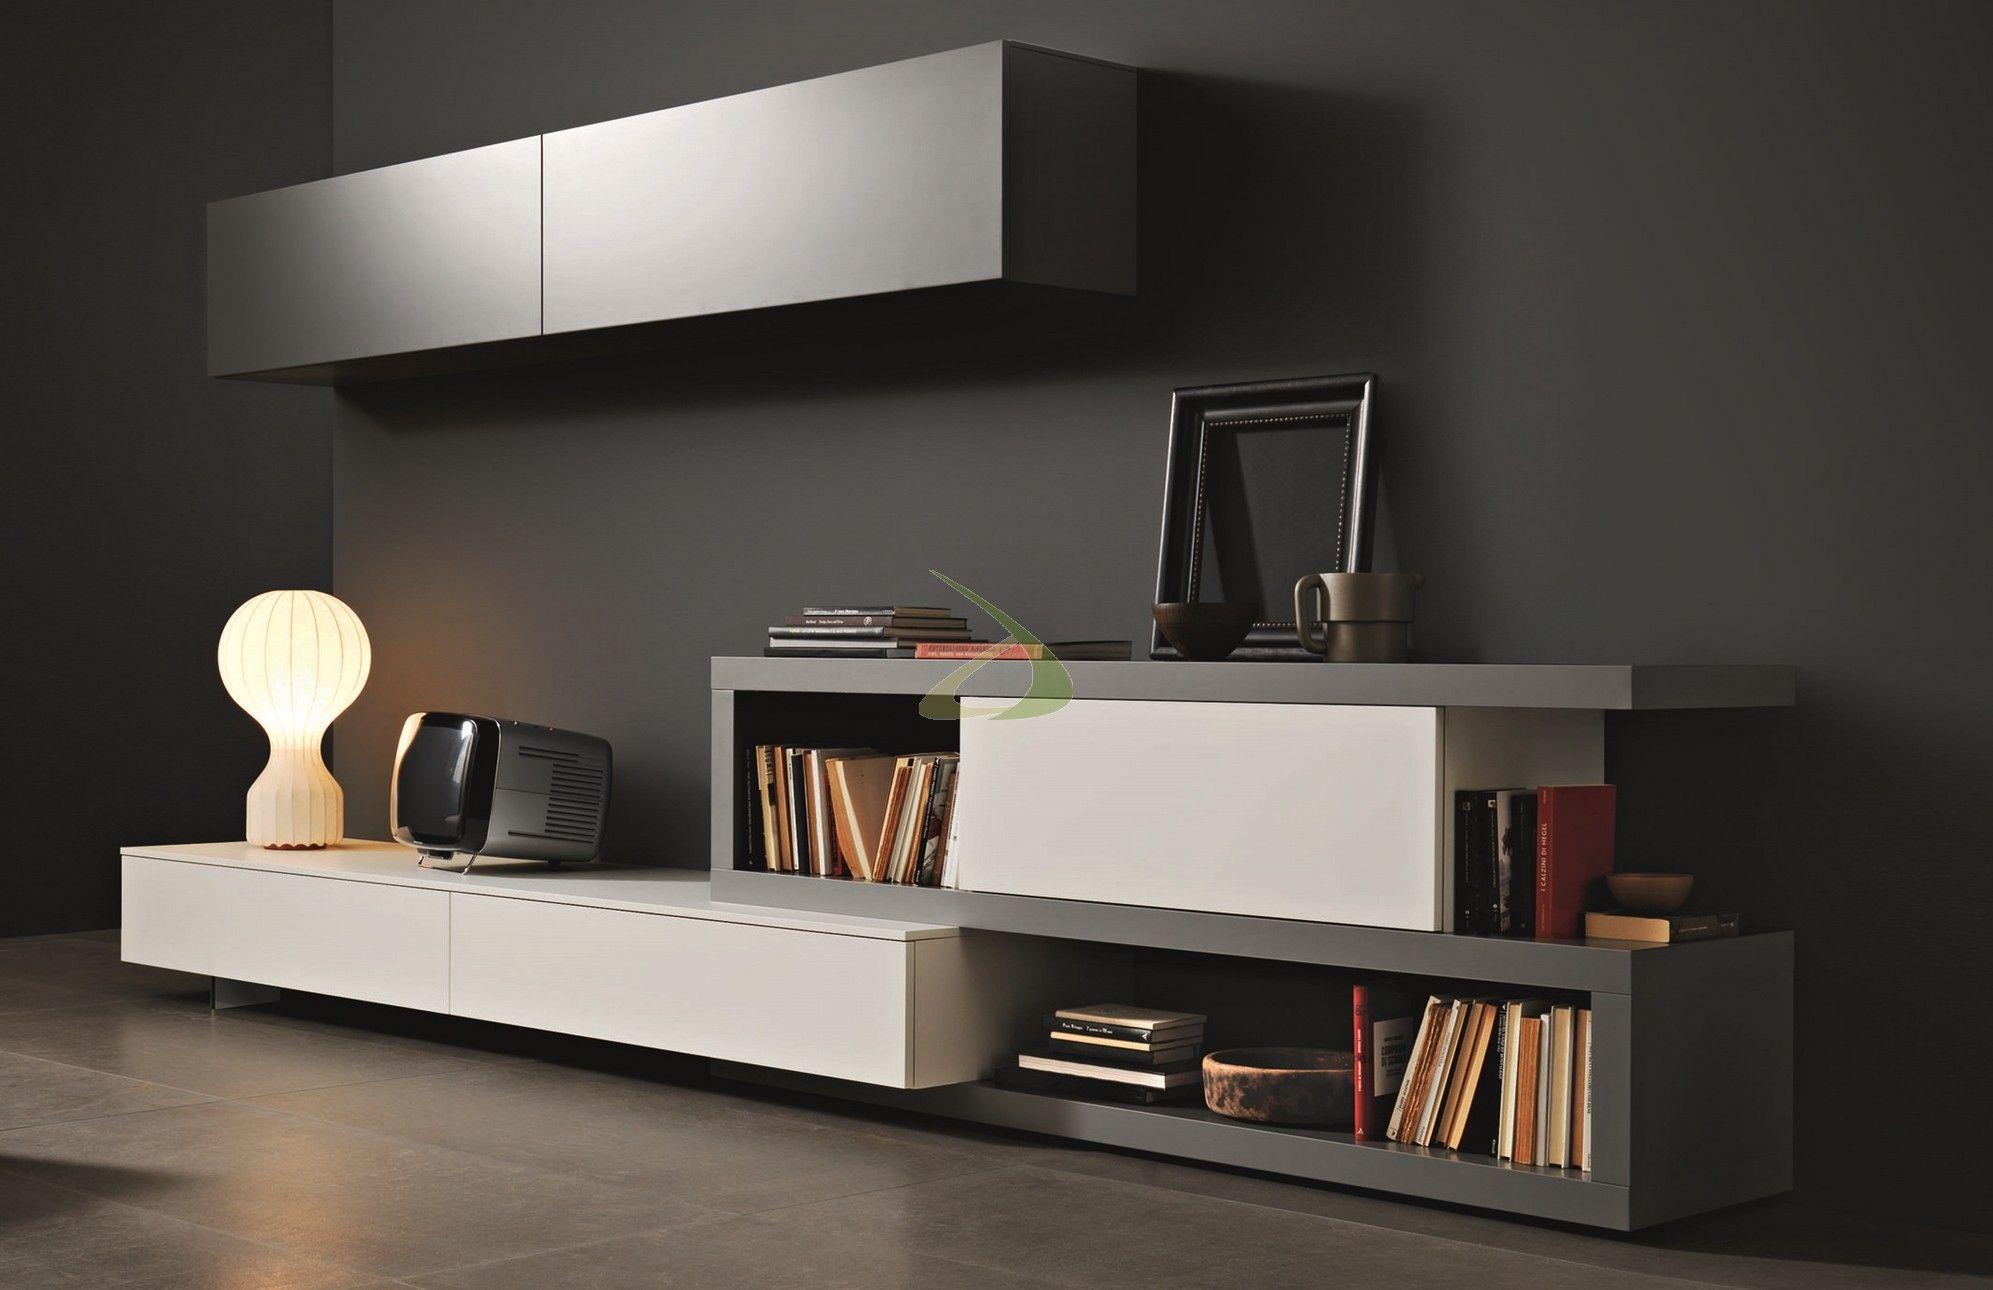 Soggiorno Sangiacomo ~ Disegno wall unit v by sangiacomo italy in grey oak veneer and